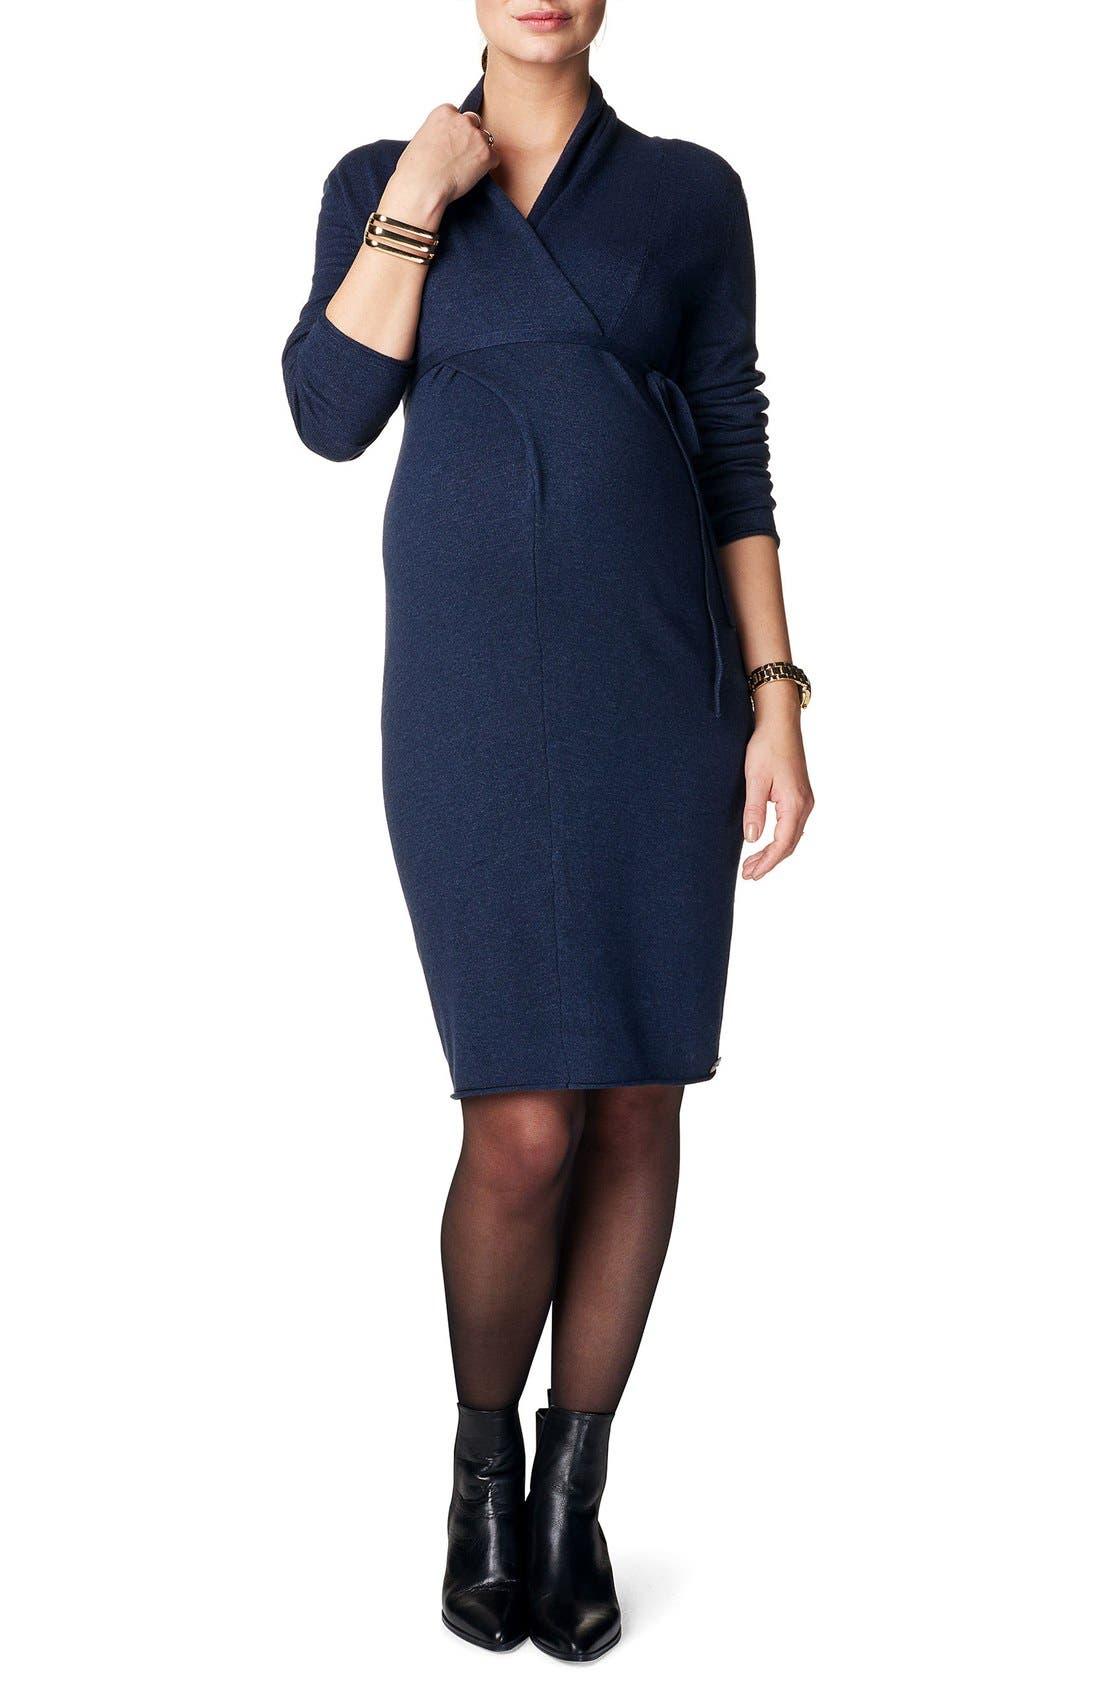 Zara Knit Maternity Sweater Dress,                         Main,                         color, DARK BLUE